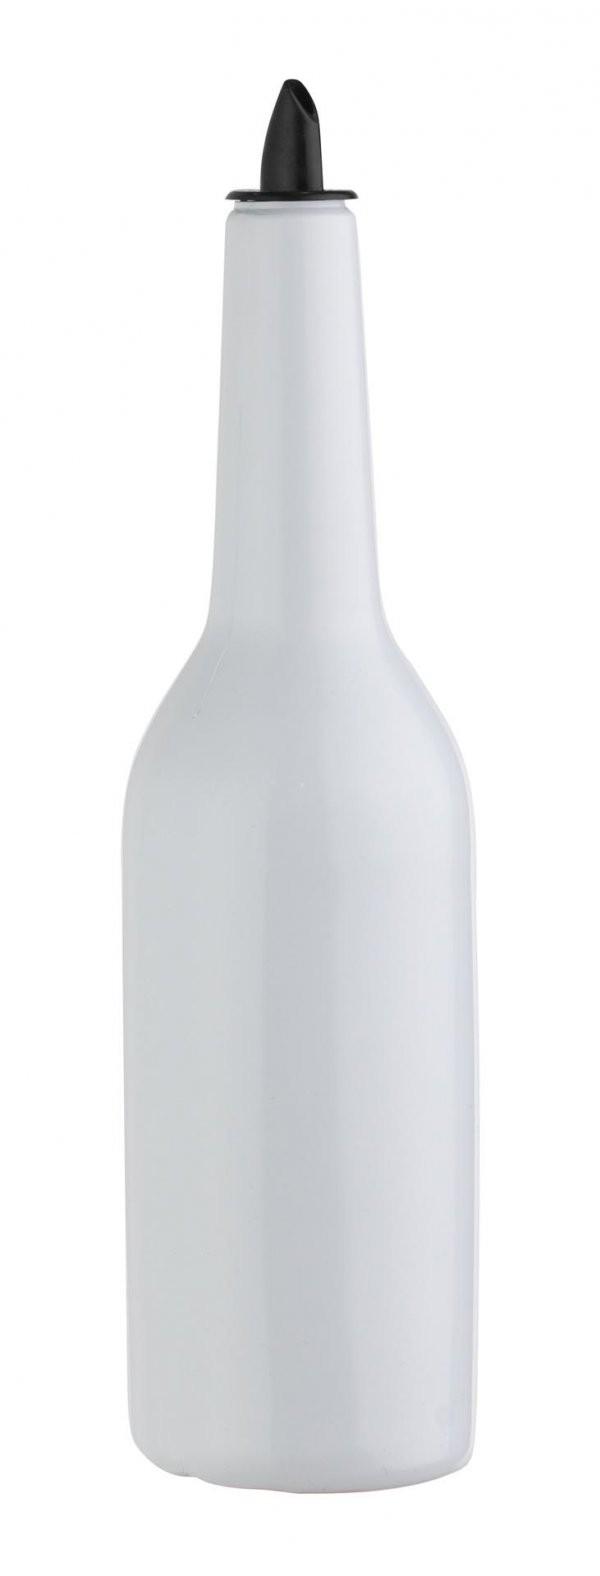 Flair Bottle 750ml